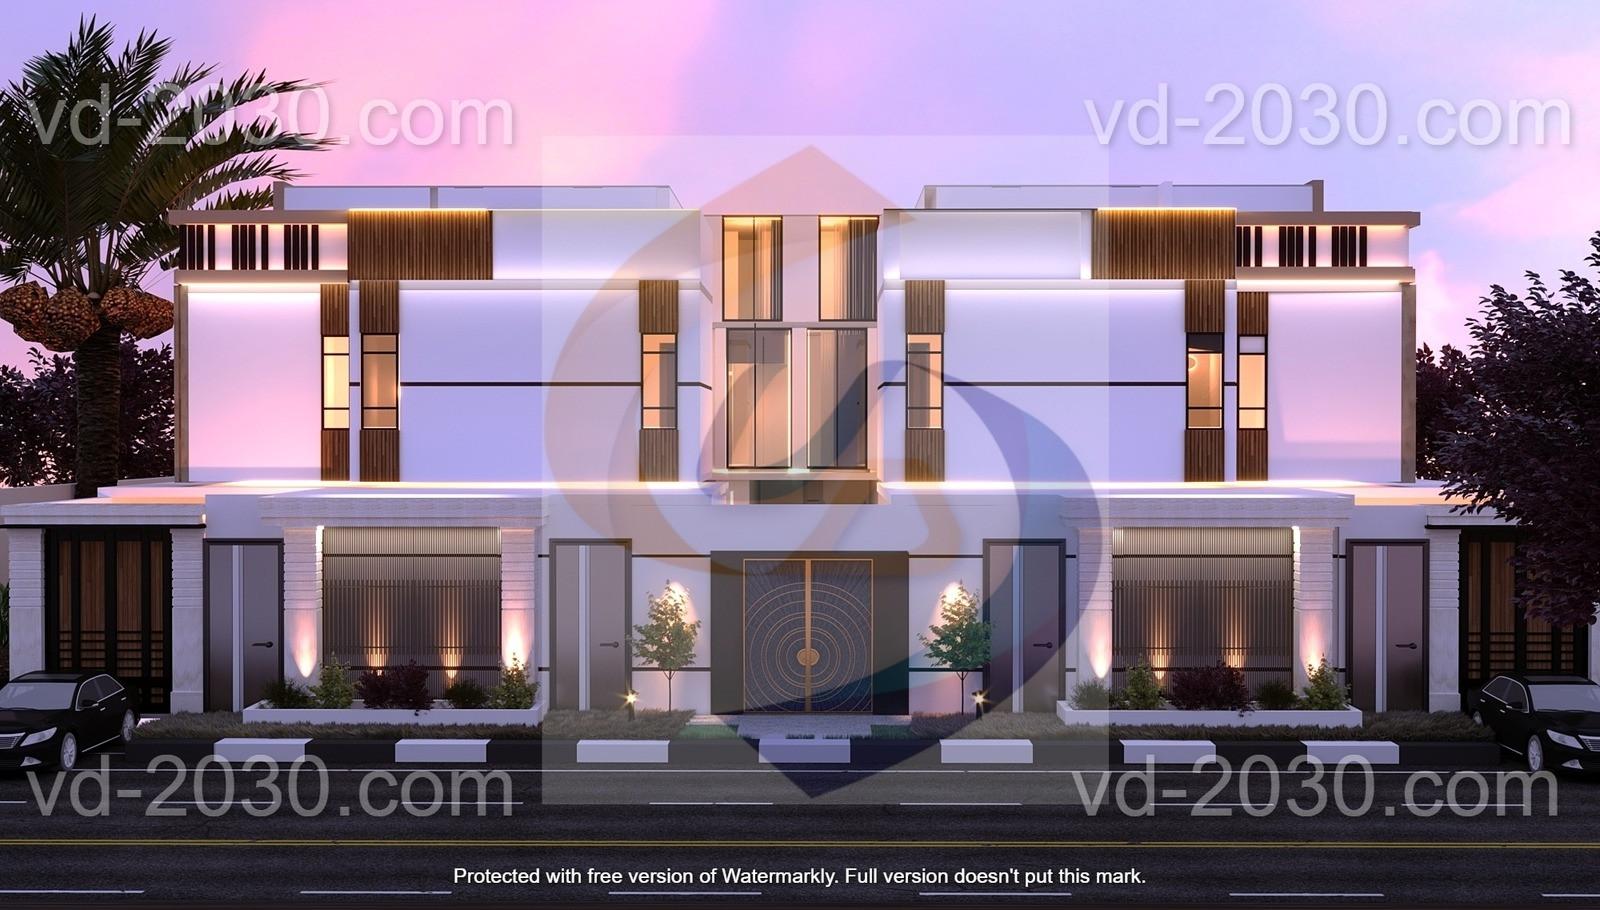 Villa on Al Ameri  - vision dimensions - ابعاد الرؤية